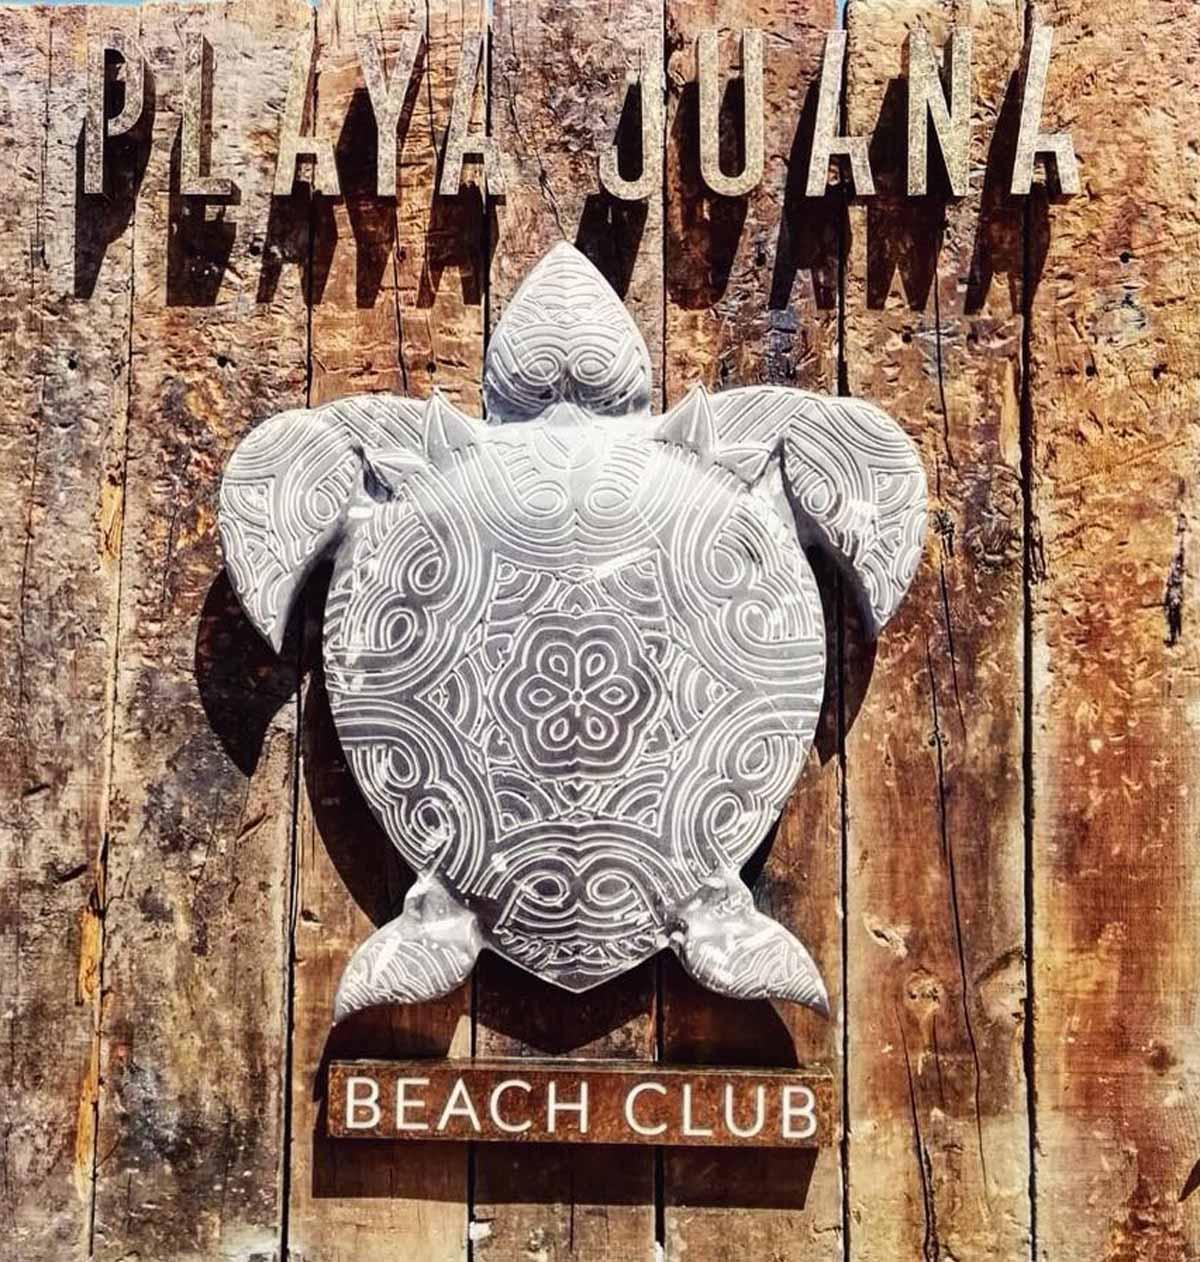 diseñp de logotipo en madera para beach club